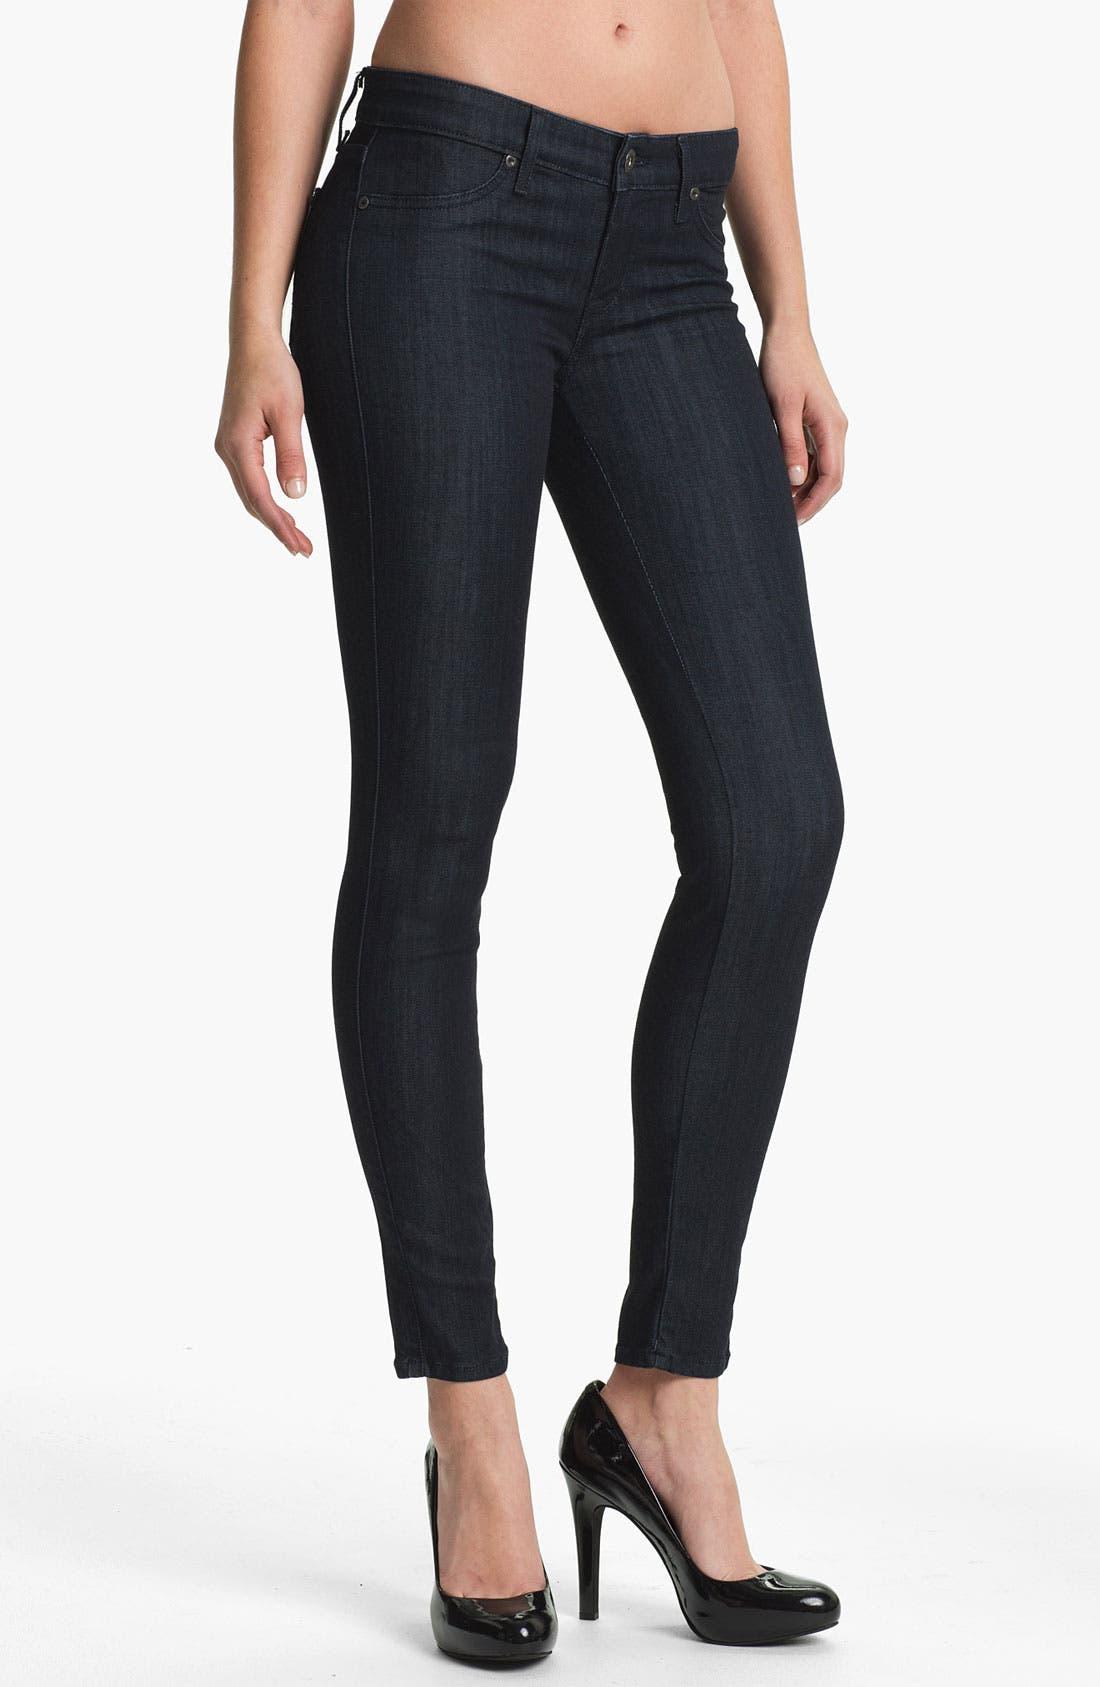 Alternate Image 1 Selected - Rich & Skinny 'Legacy' Skinny Jeans (Indigo Rinse)